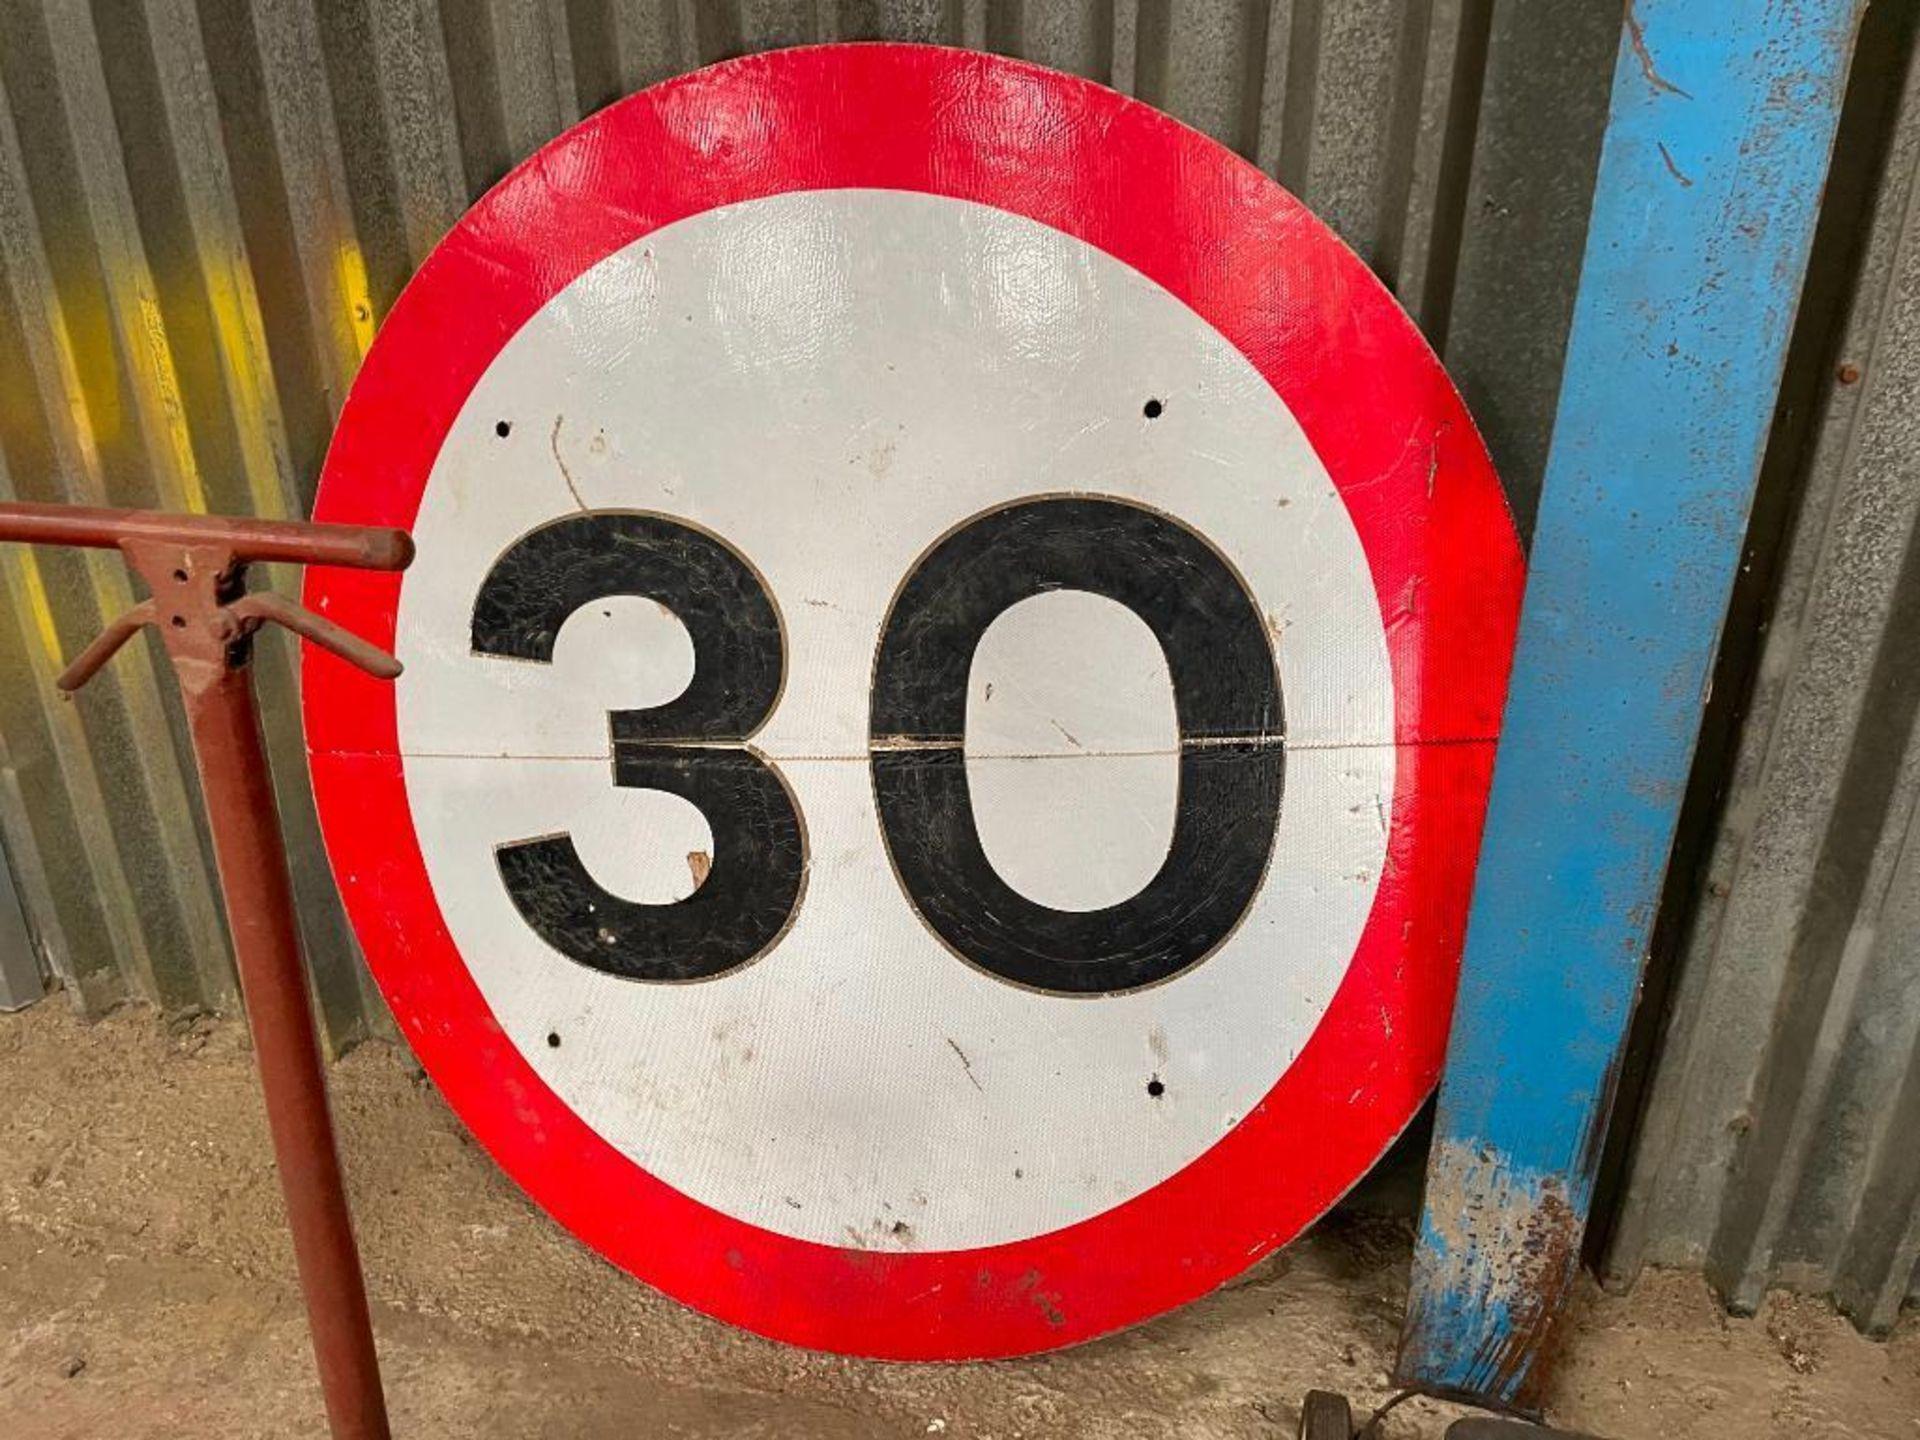 Speed warning sign - Image 2 of 2